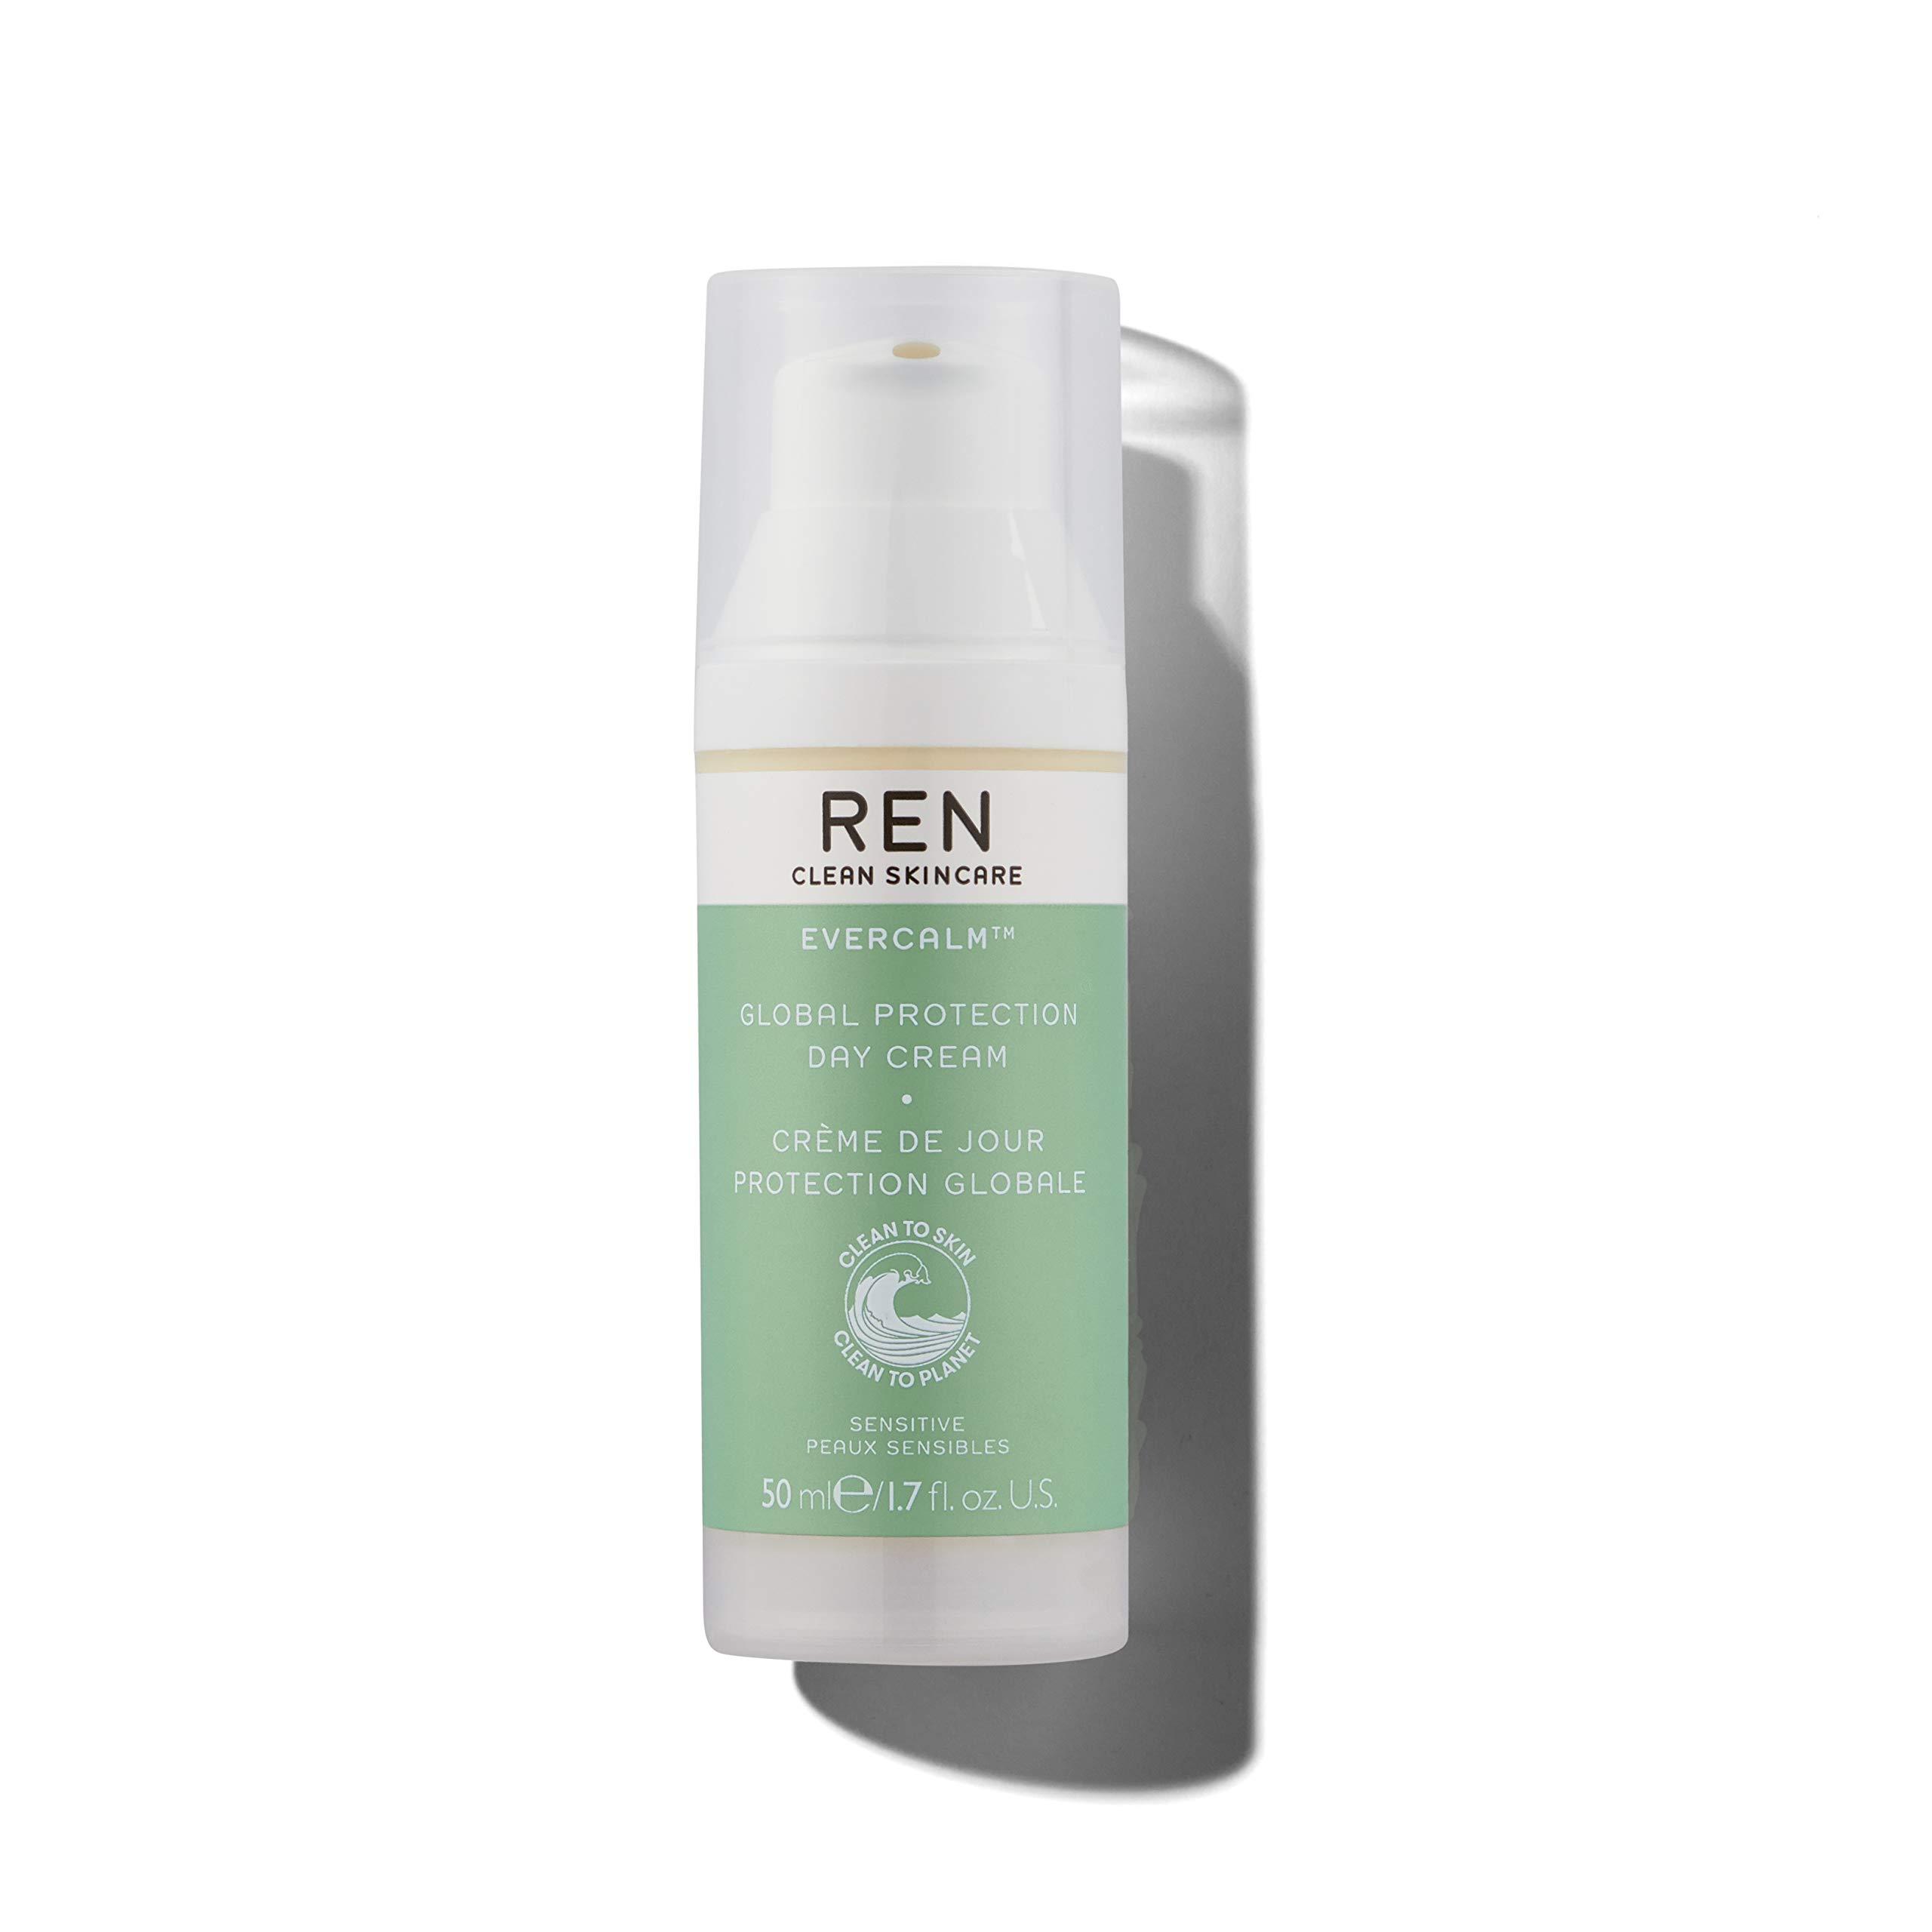 REN Clean Skincare Facial Moisturizing Cream 50 ml